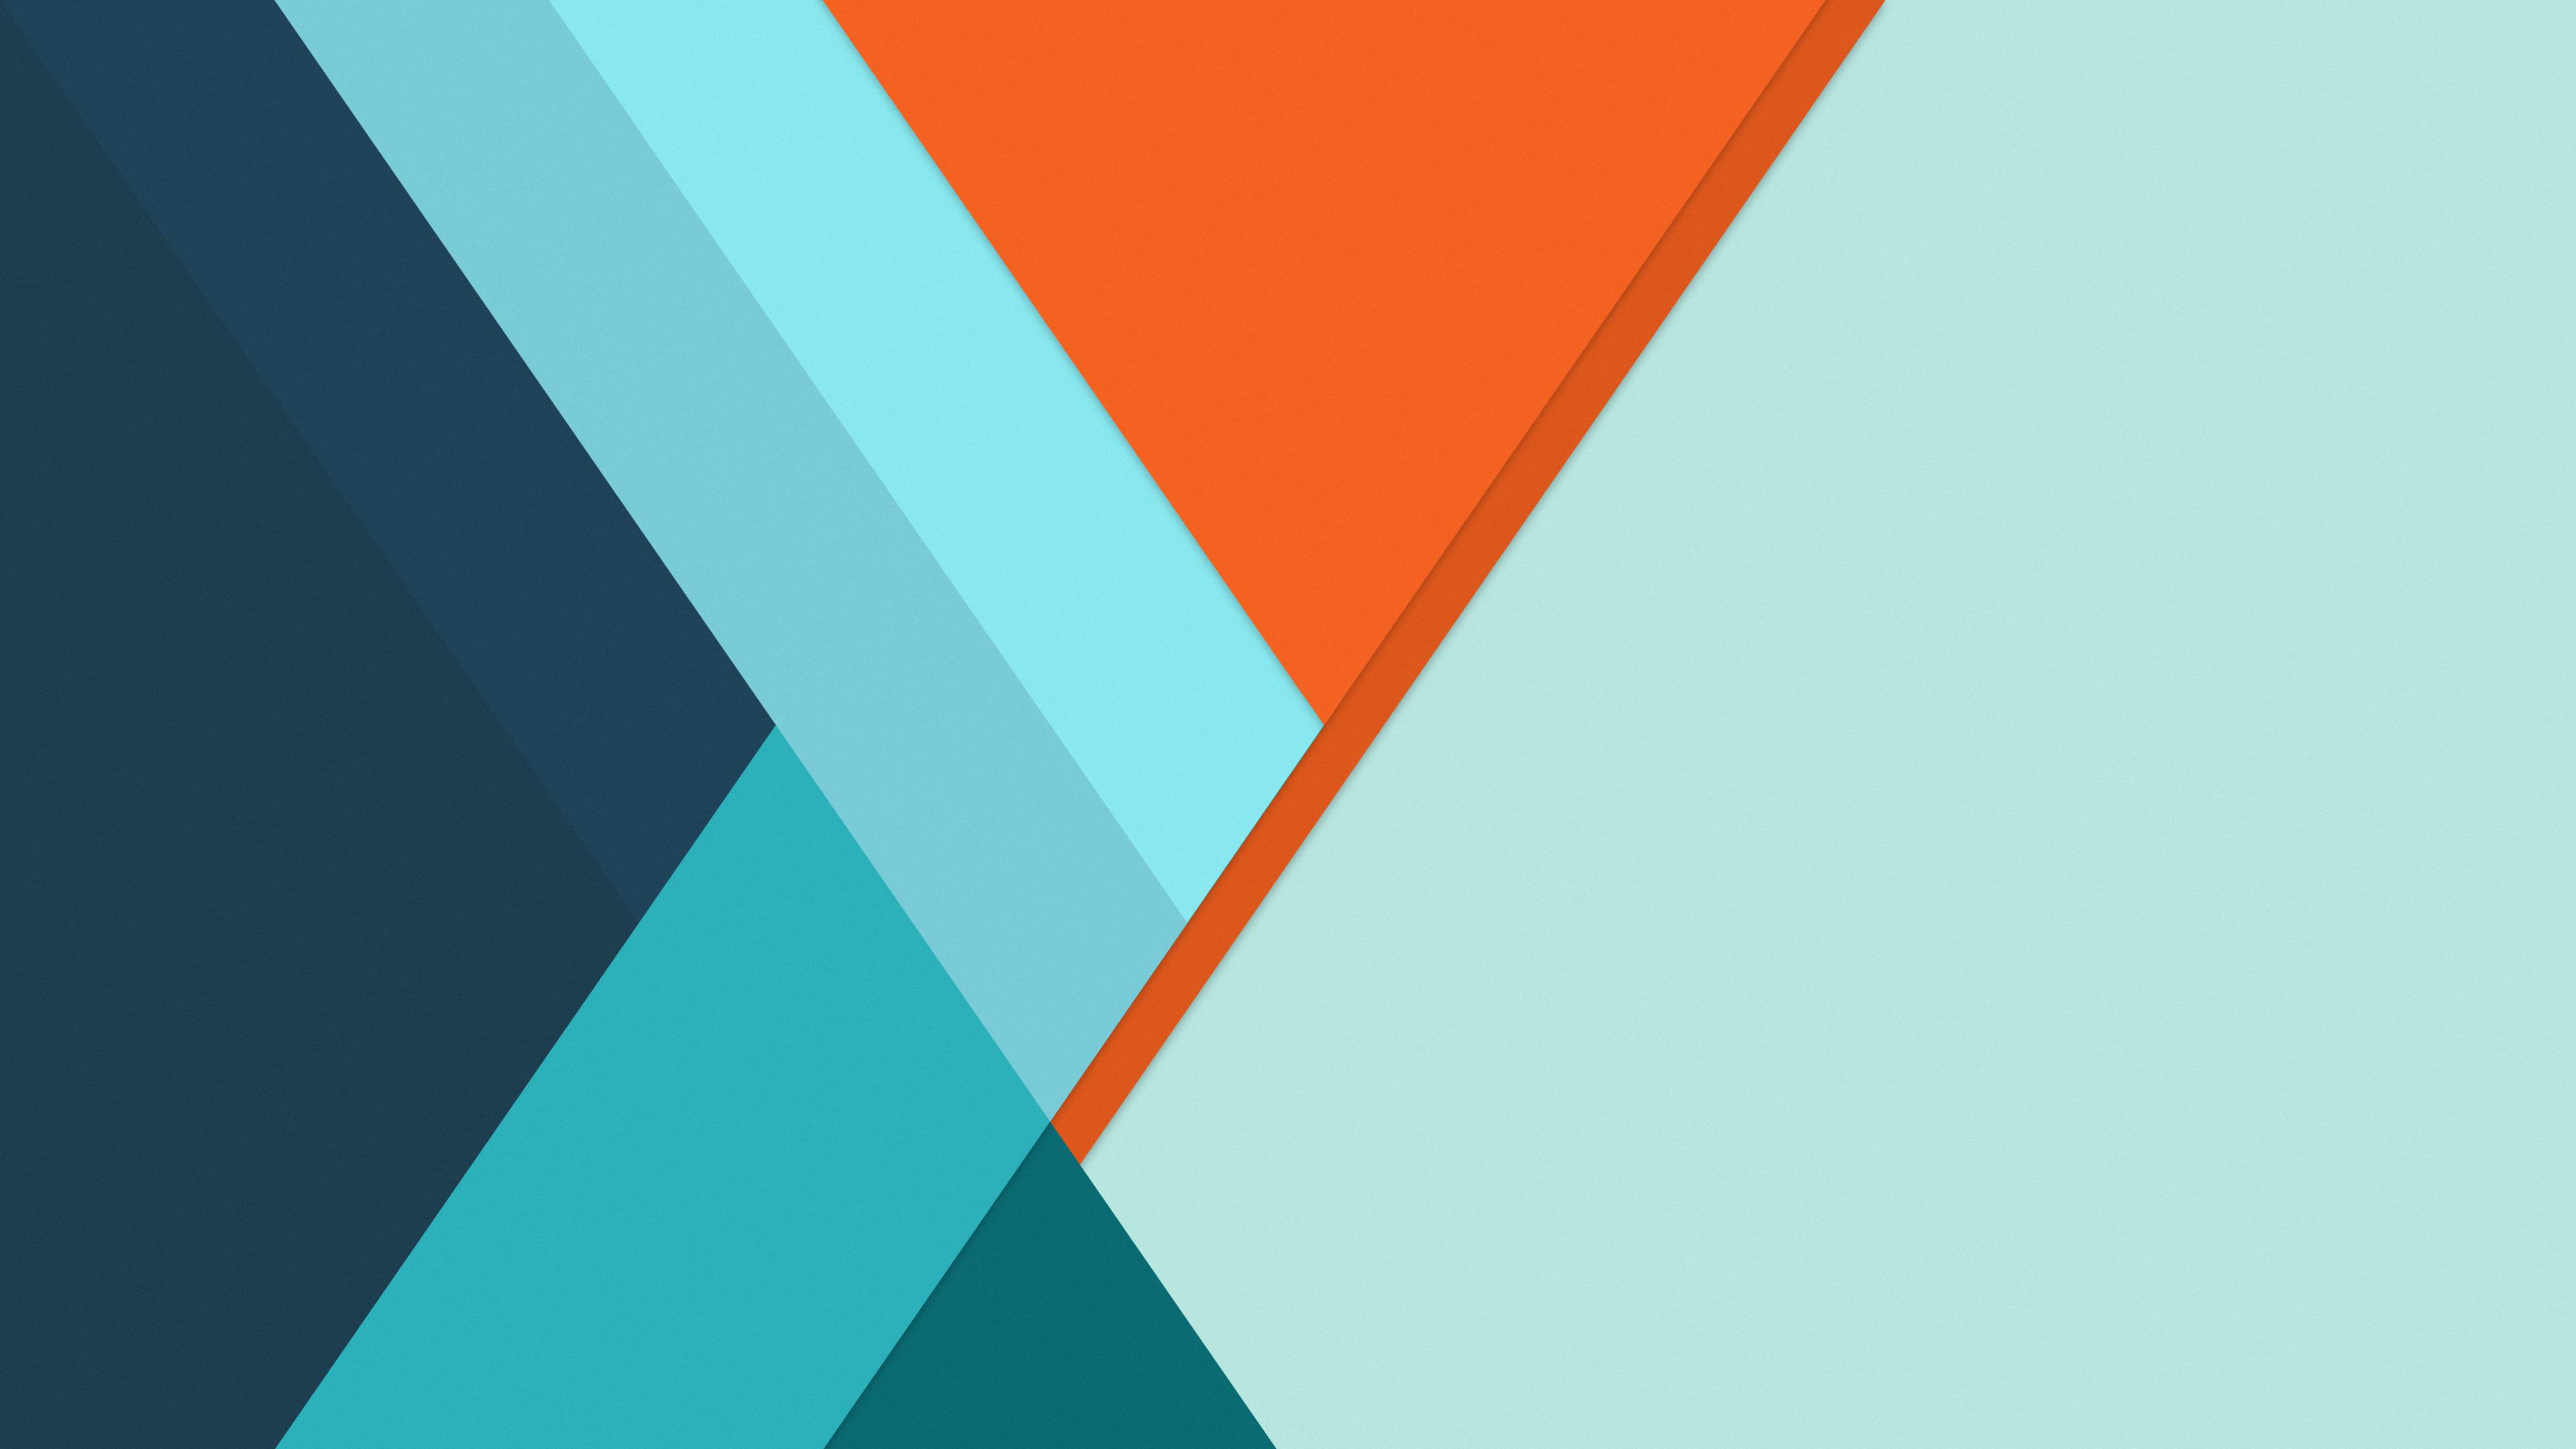 material minimalist 4k 1539371343 - Material Minimalist 4k - minimalist wallpapers, minimalism wallpapers, material wallpapers, hd-wallpapers, digital art wallpapers, deviantart wallpapers, design wallpapers, artist wallpapers, abstract wallpapers, 4k-wallpapers